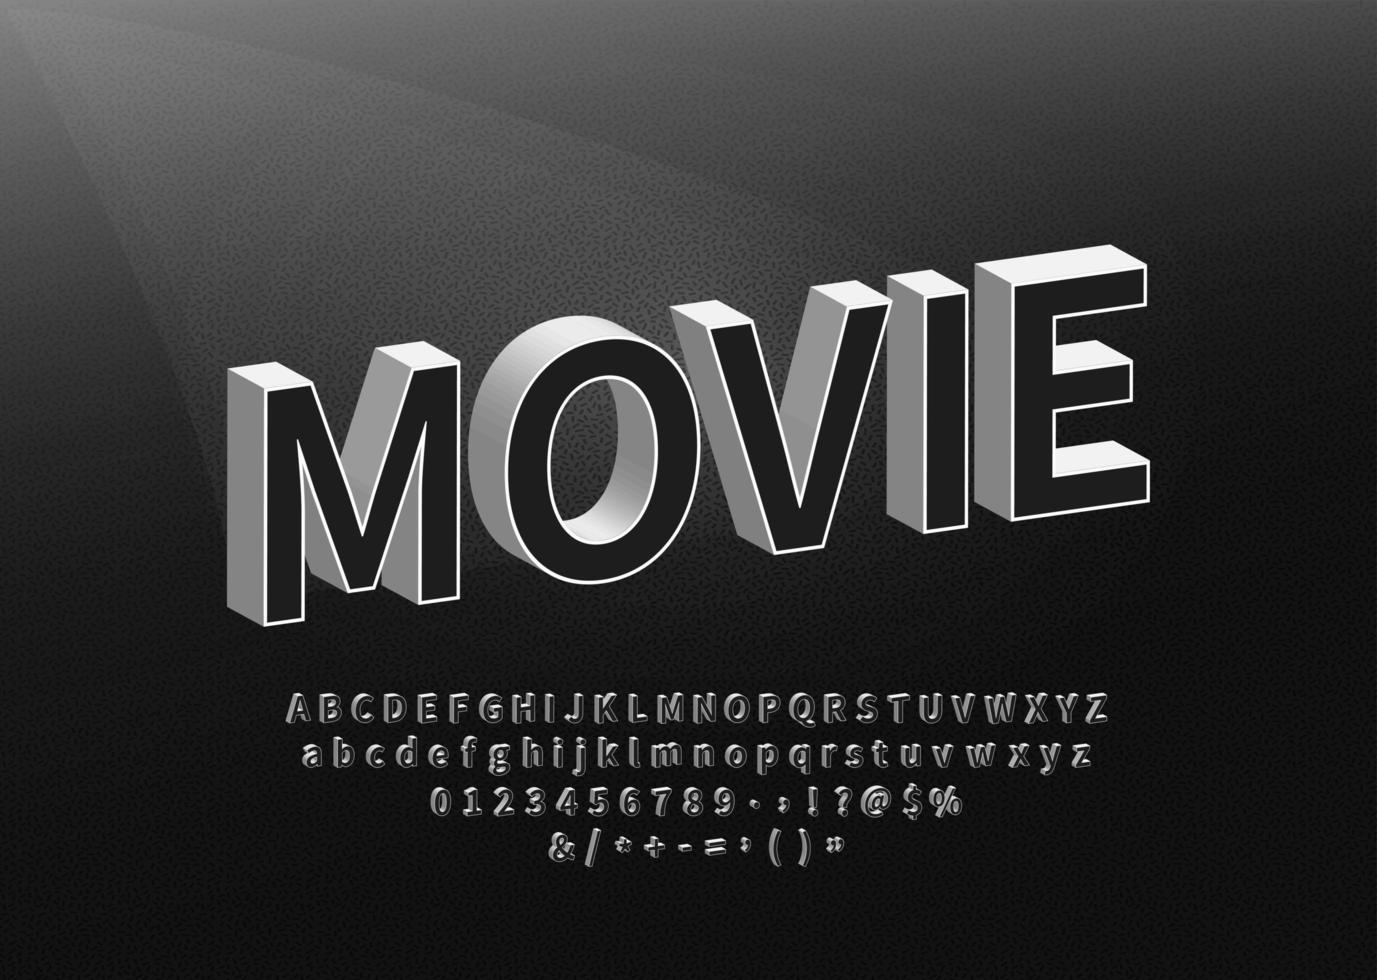 alfabeto de estilo de película retro vector